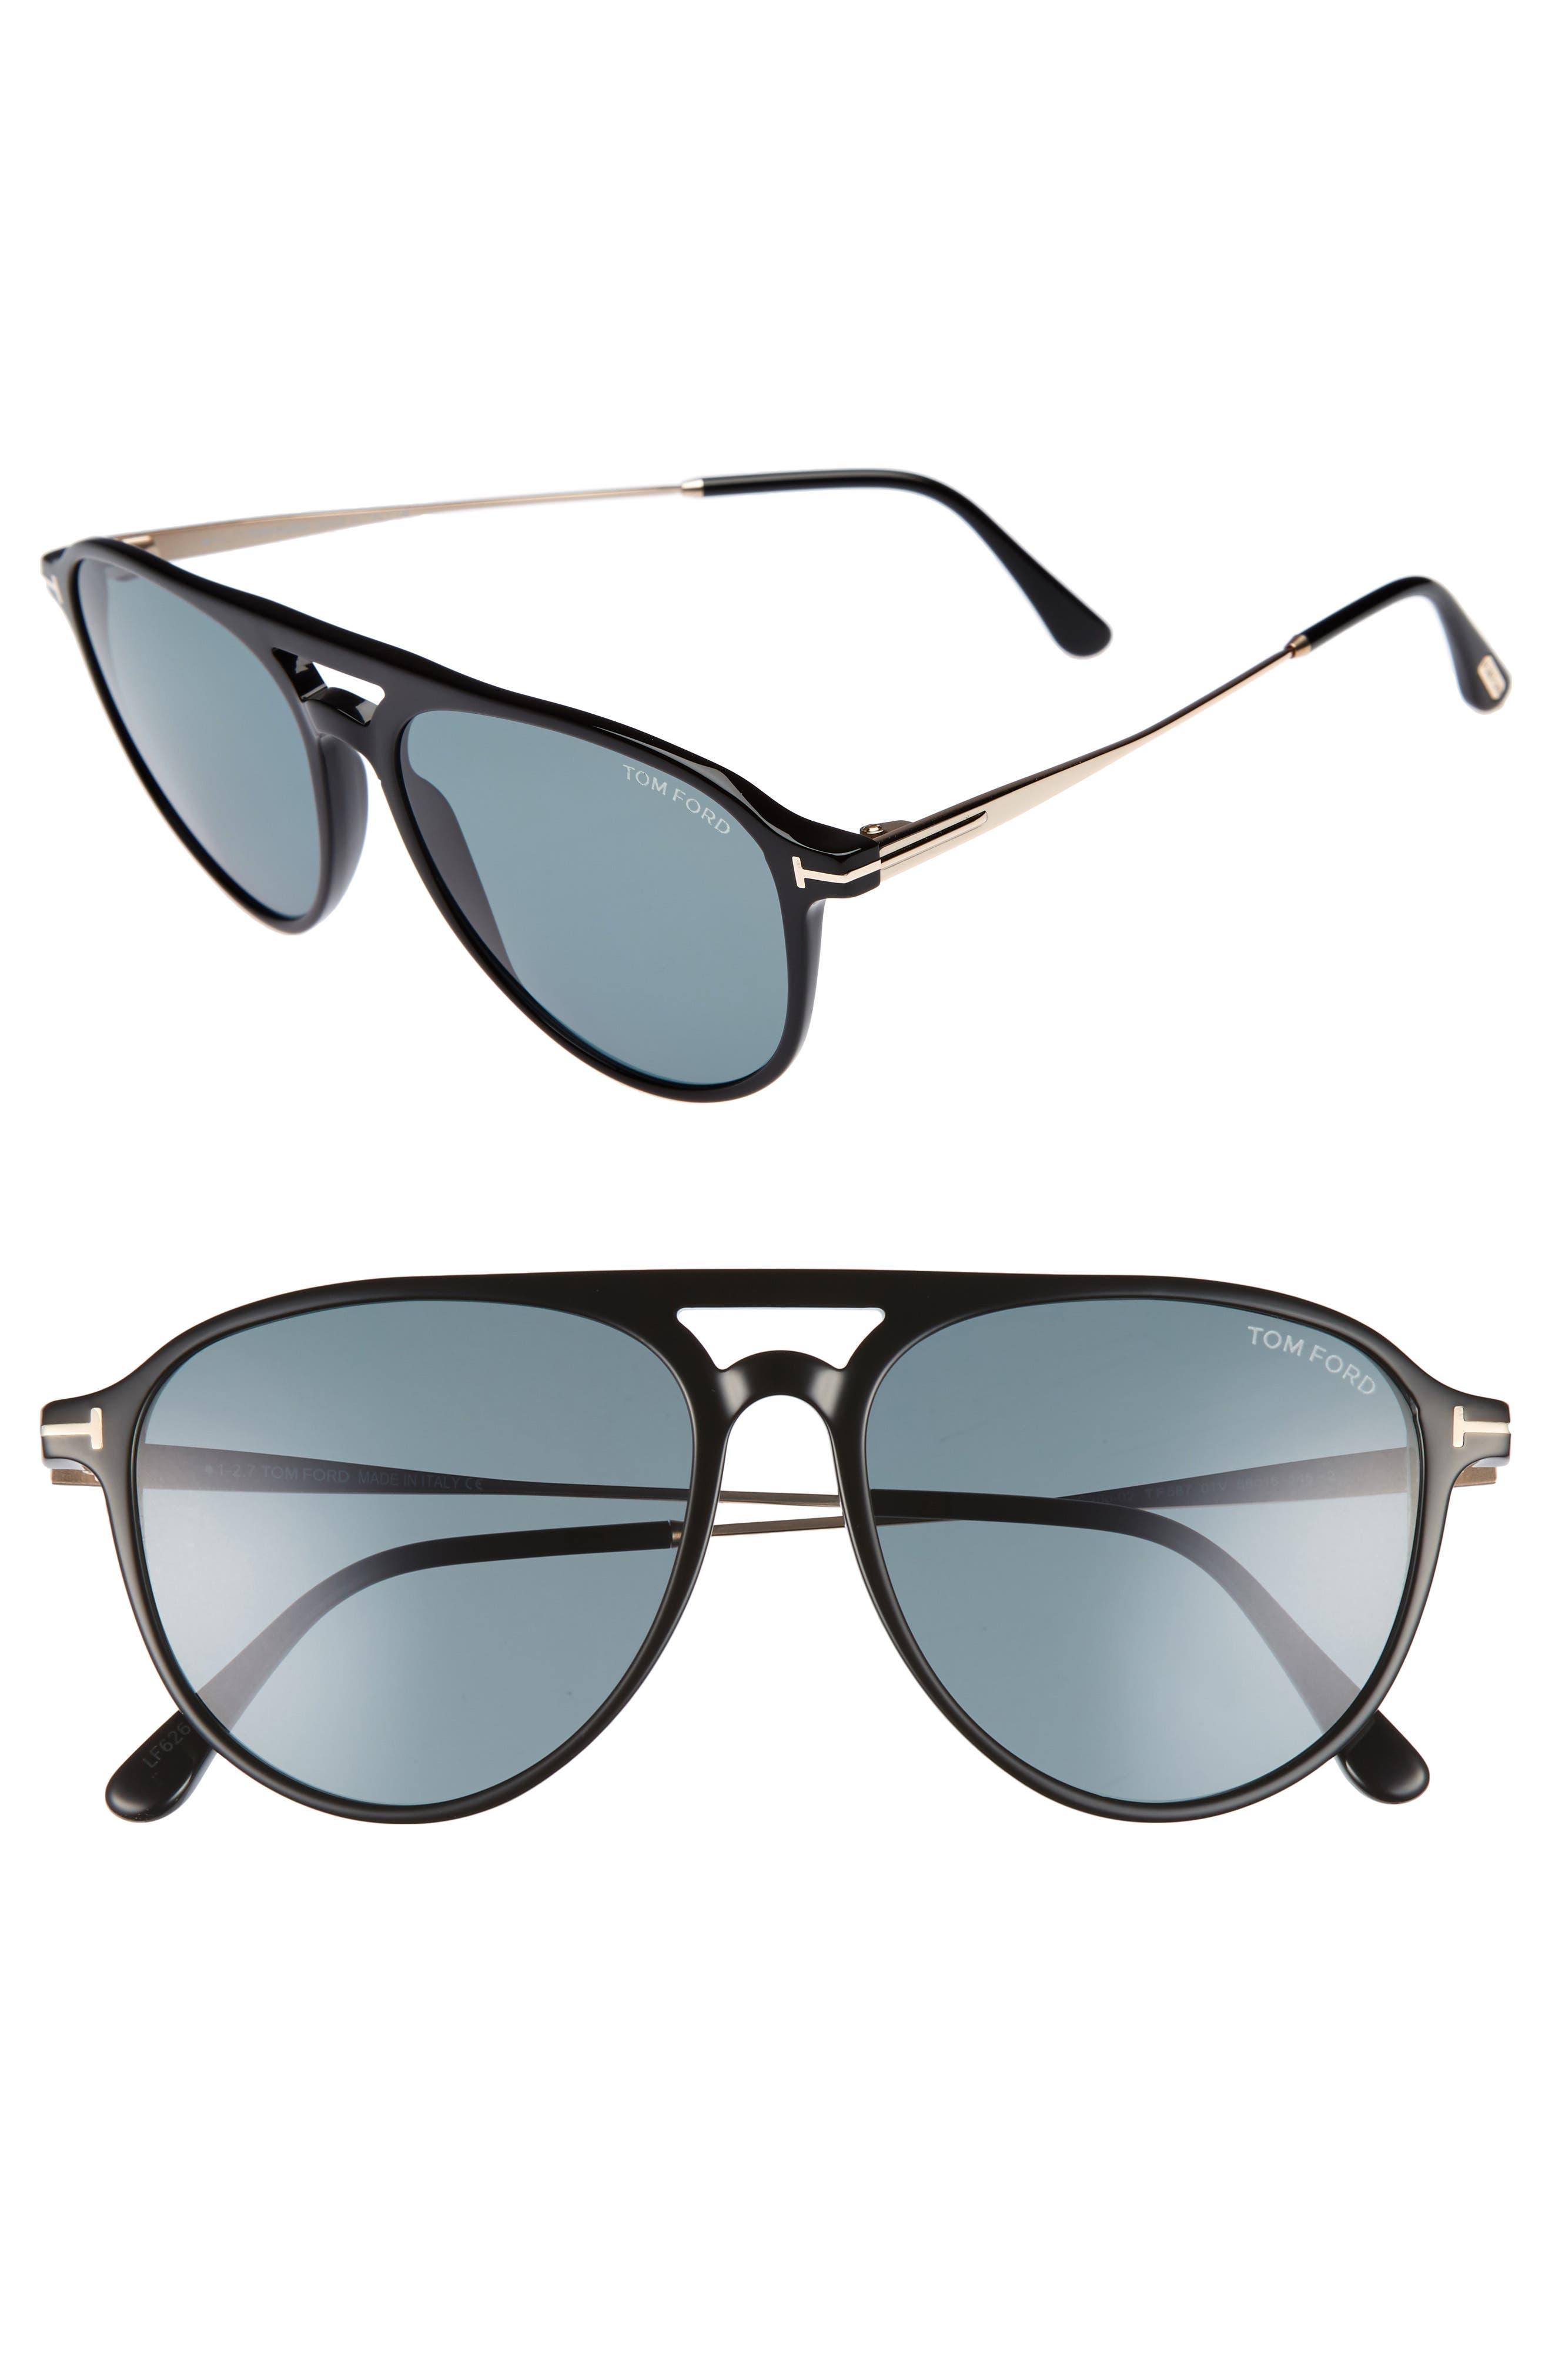 Carlo 59mm Aviator Sunglasses,                             Main thumbnail 1, color,